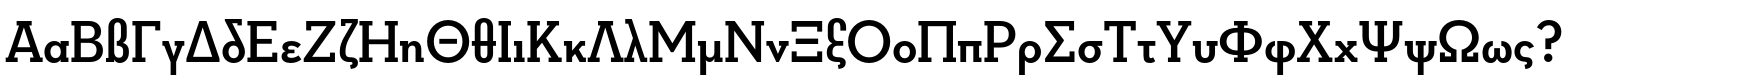 NeutrafaceSlabDisplayPro-Bold.otf